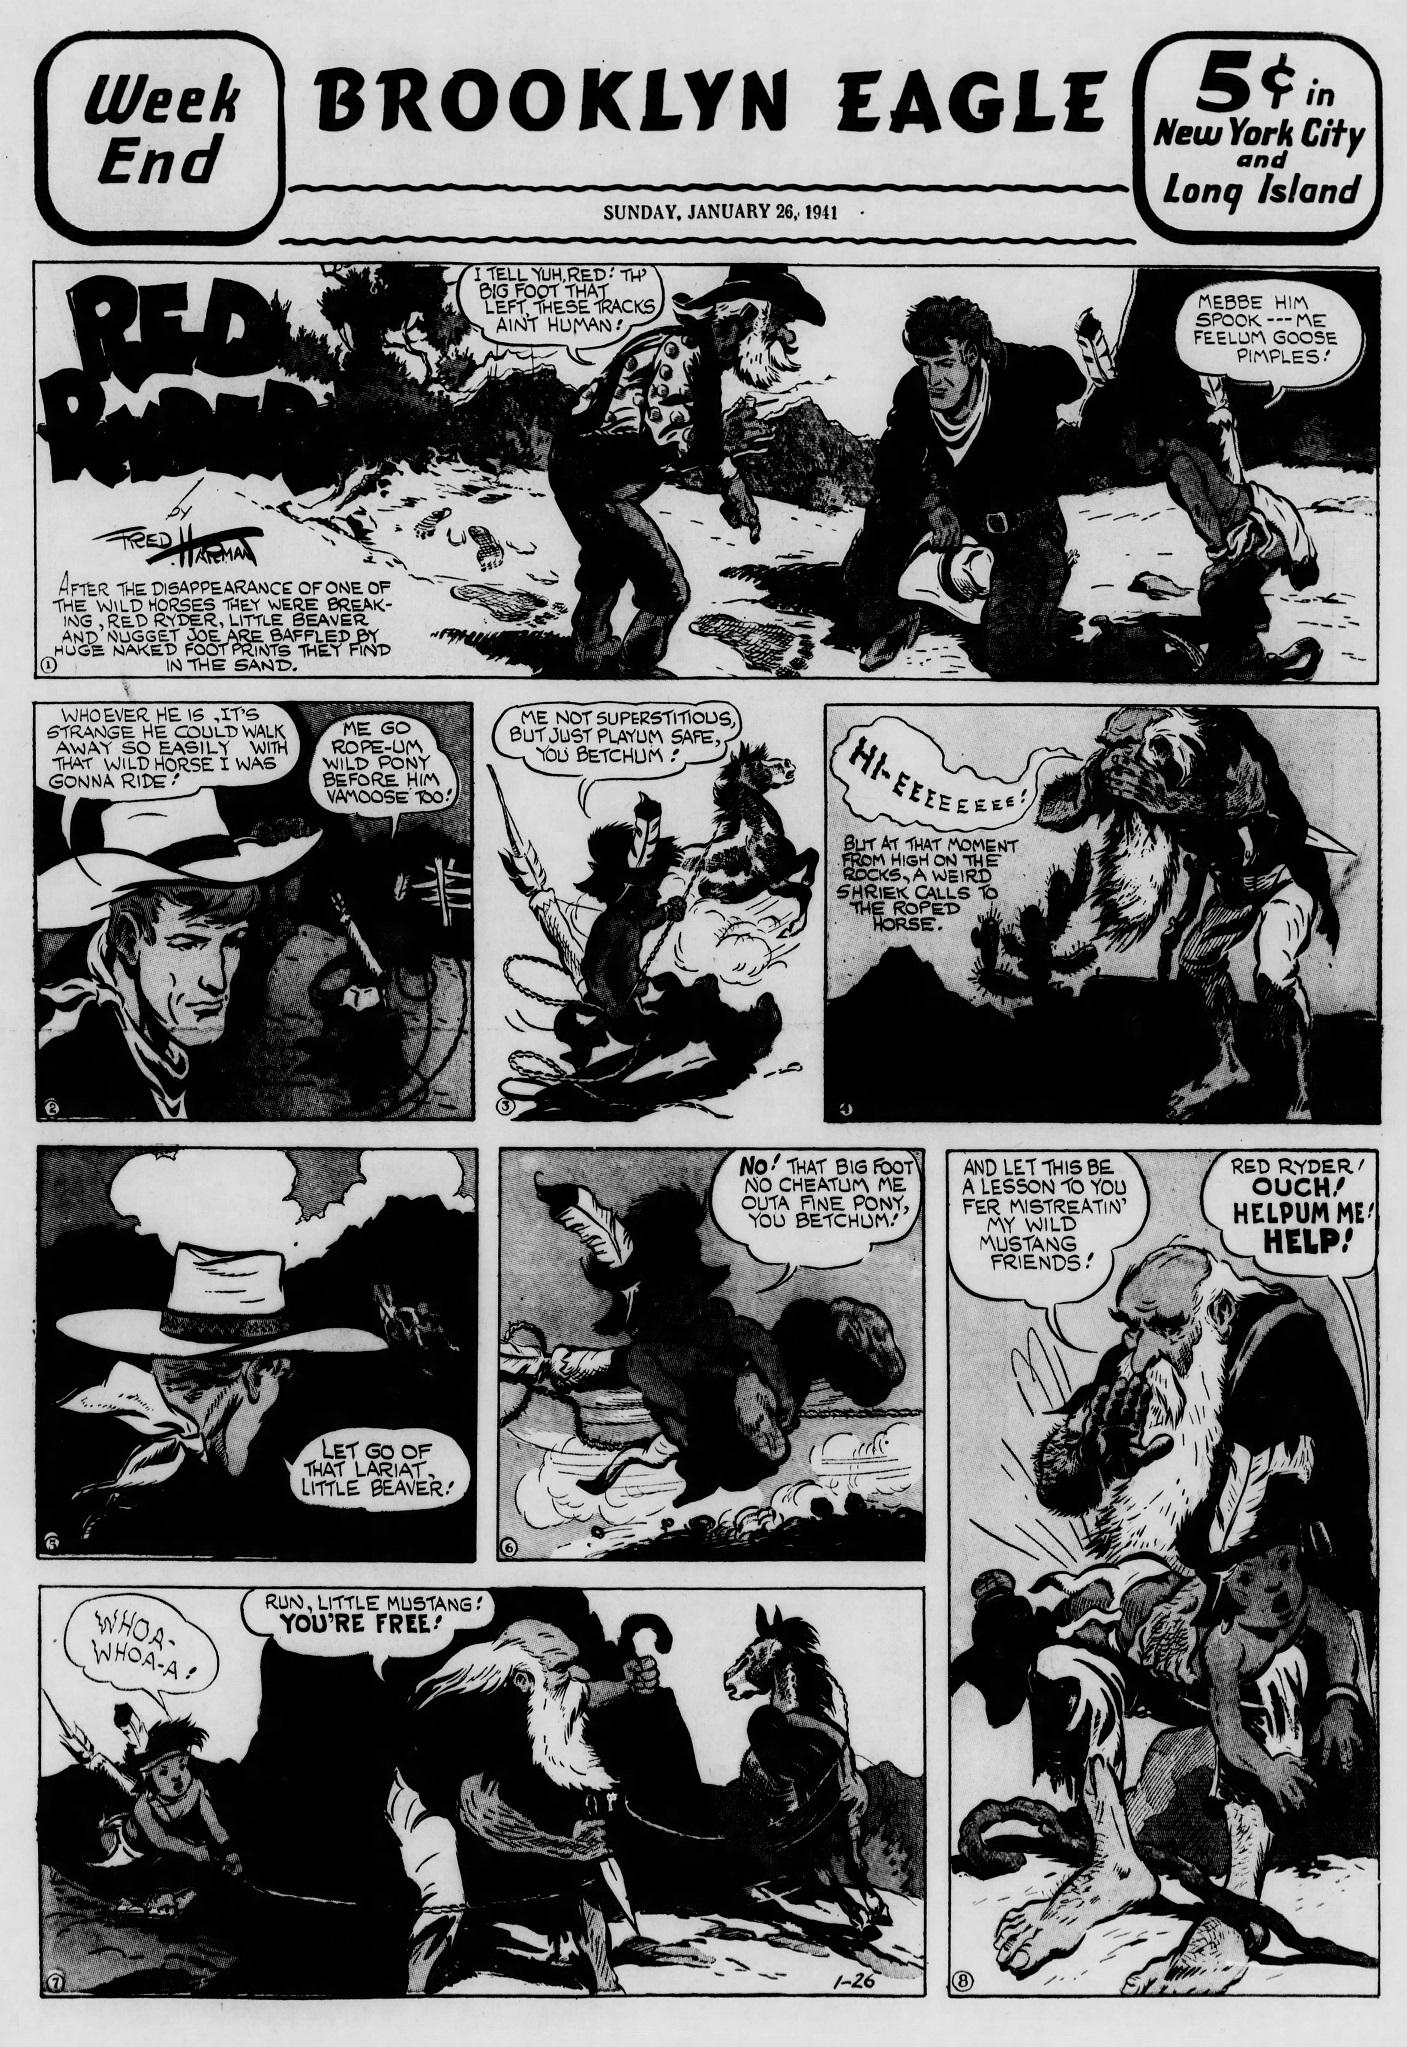 The_Brooklyn_Daily_Eagle_Sun__Jan_26__1941_(5).jpg